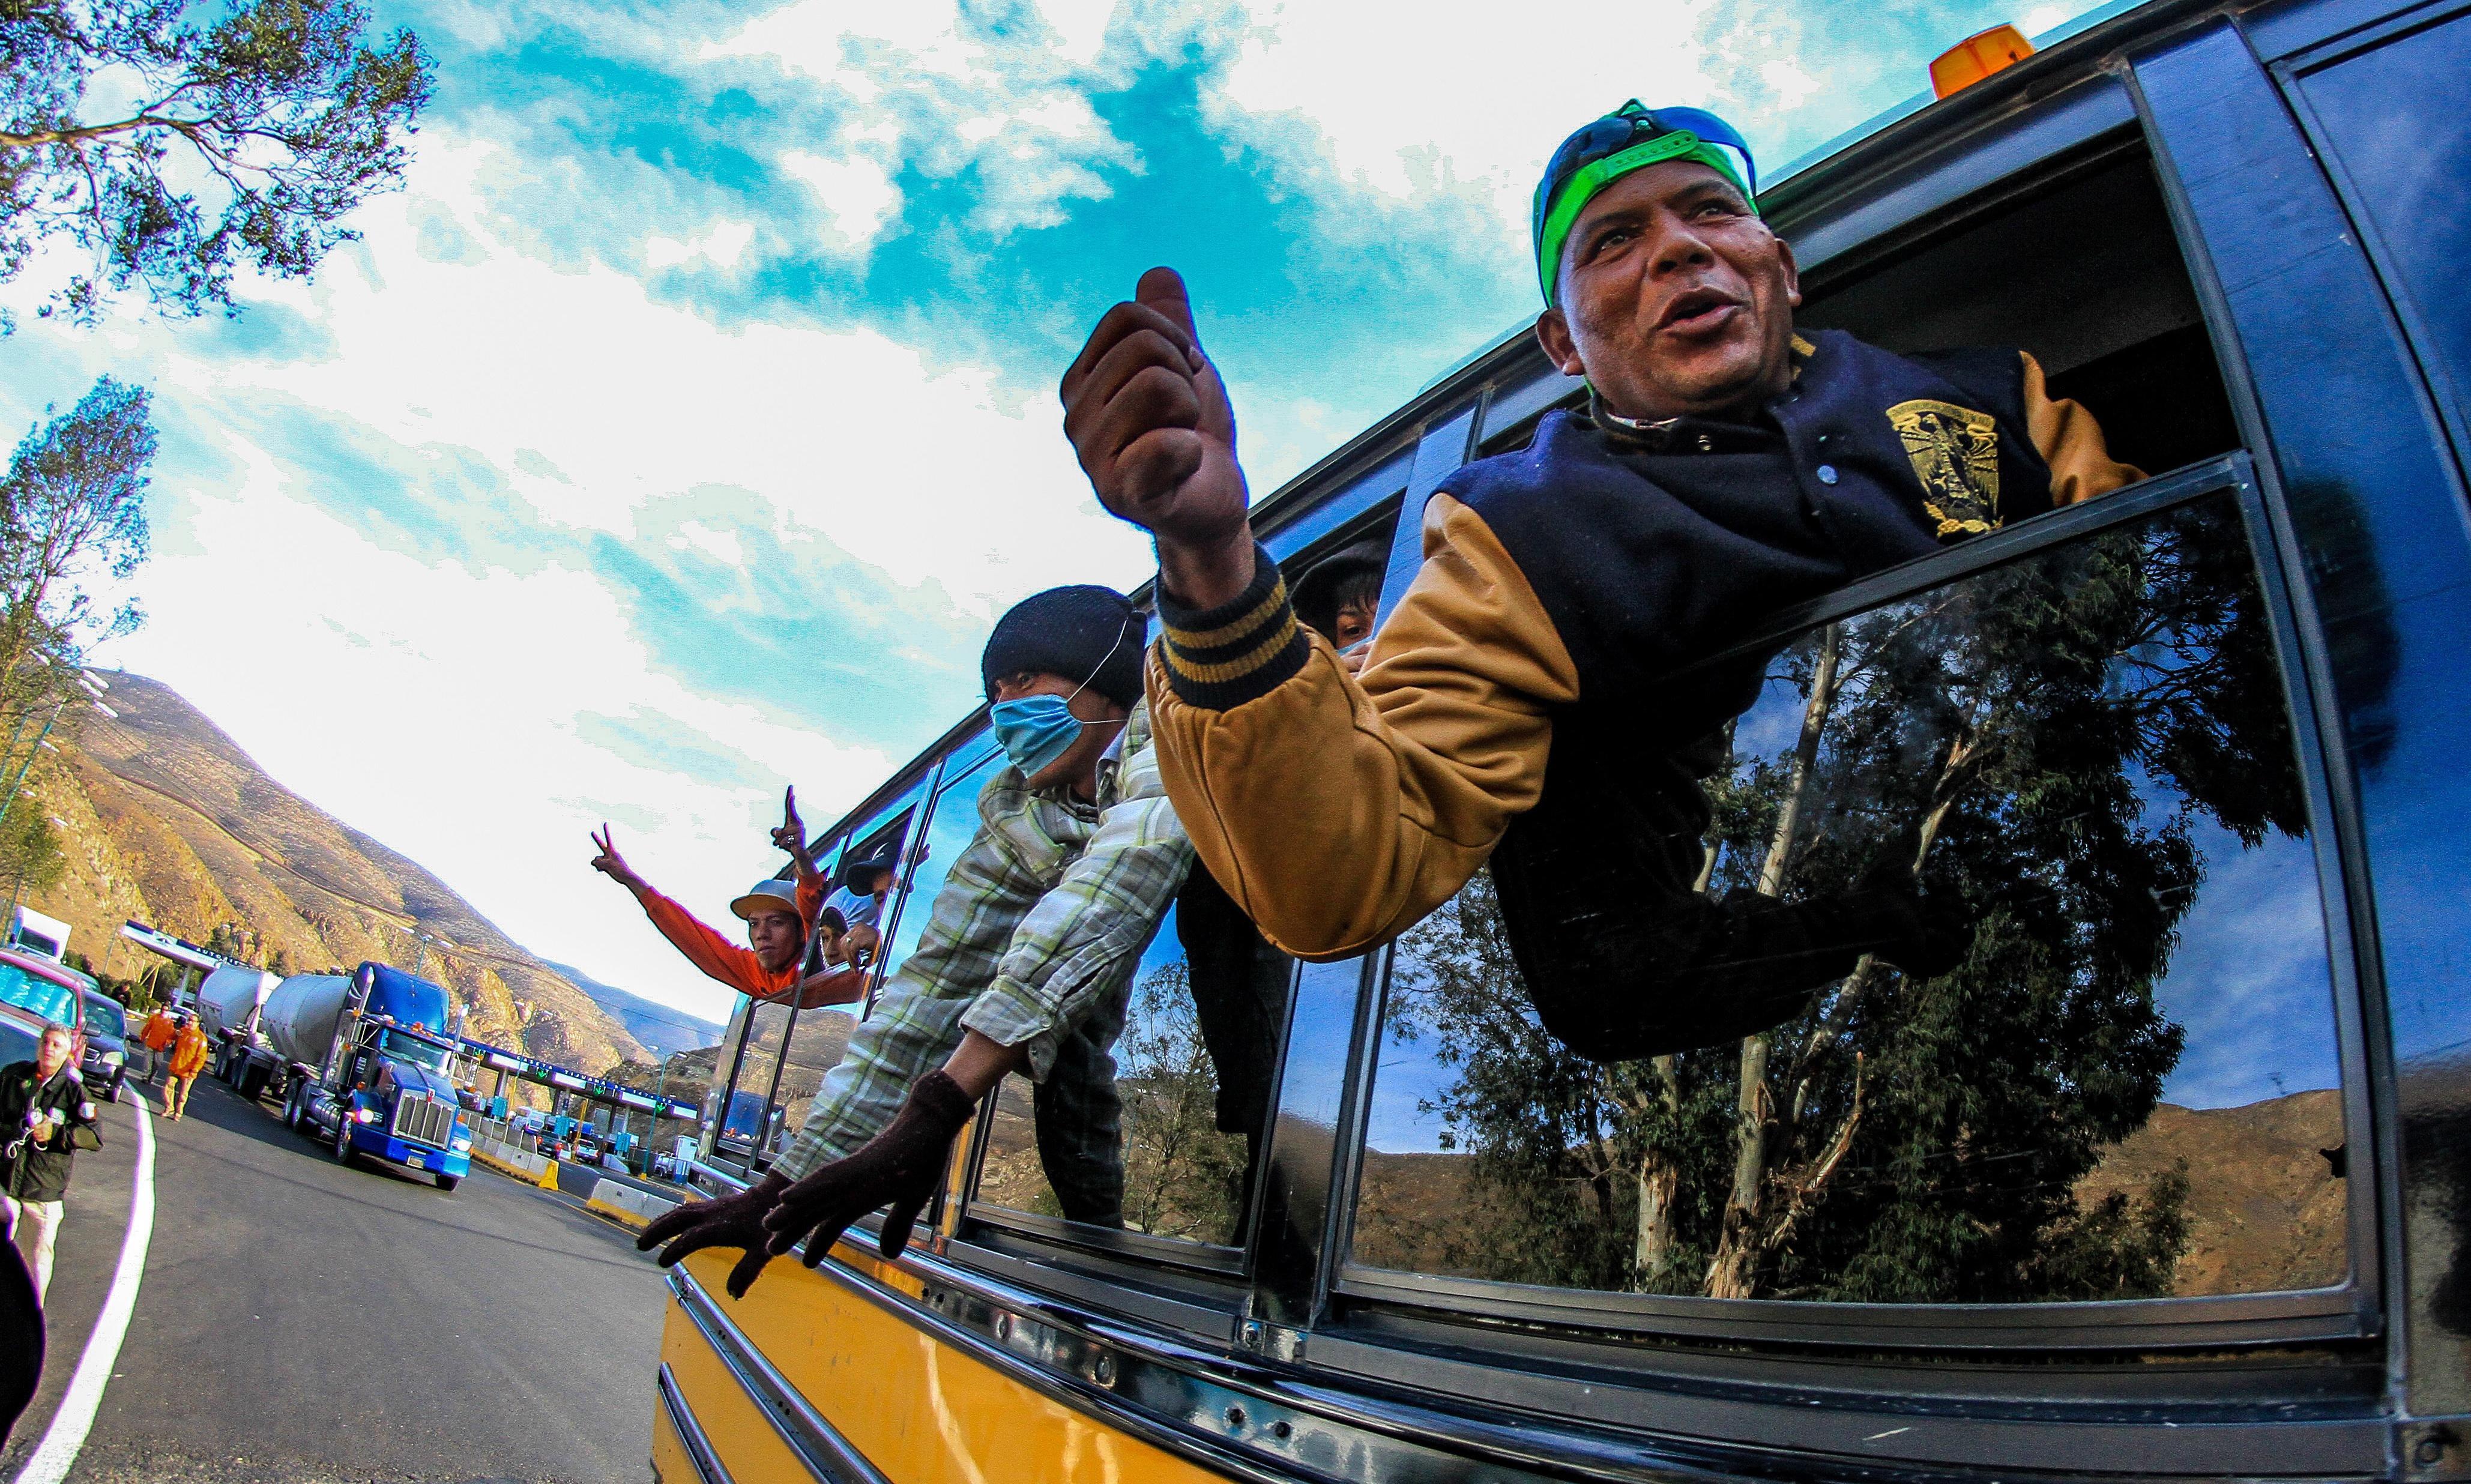 'Get out of Tijuana': migrants face racist backlash as caravan reaches US border